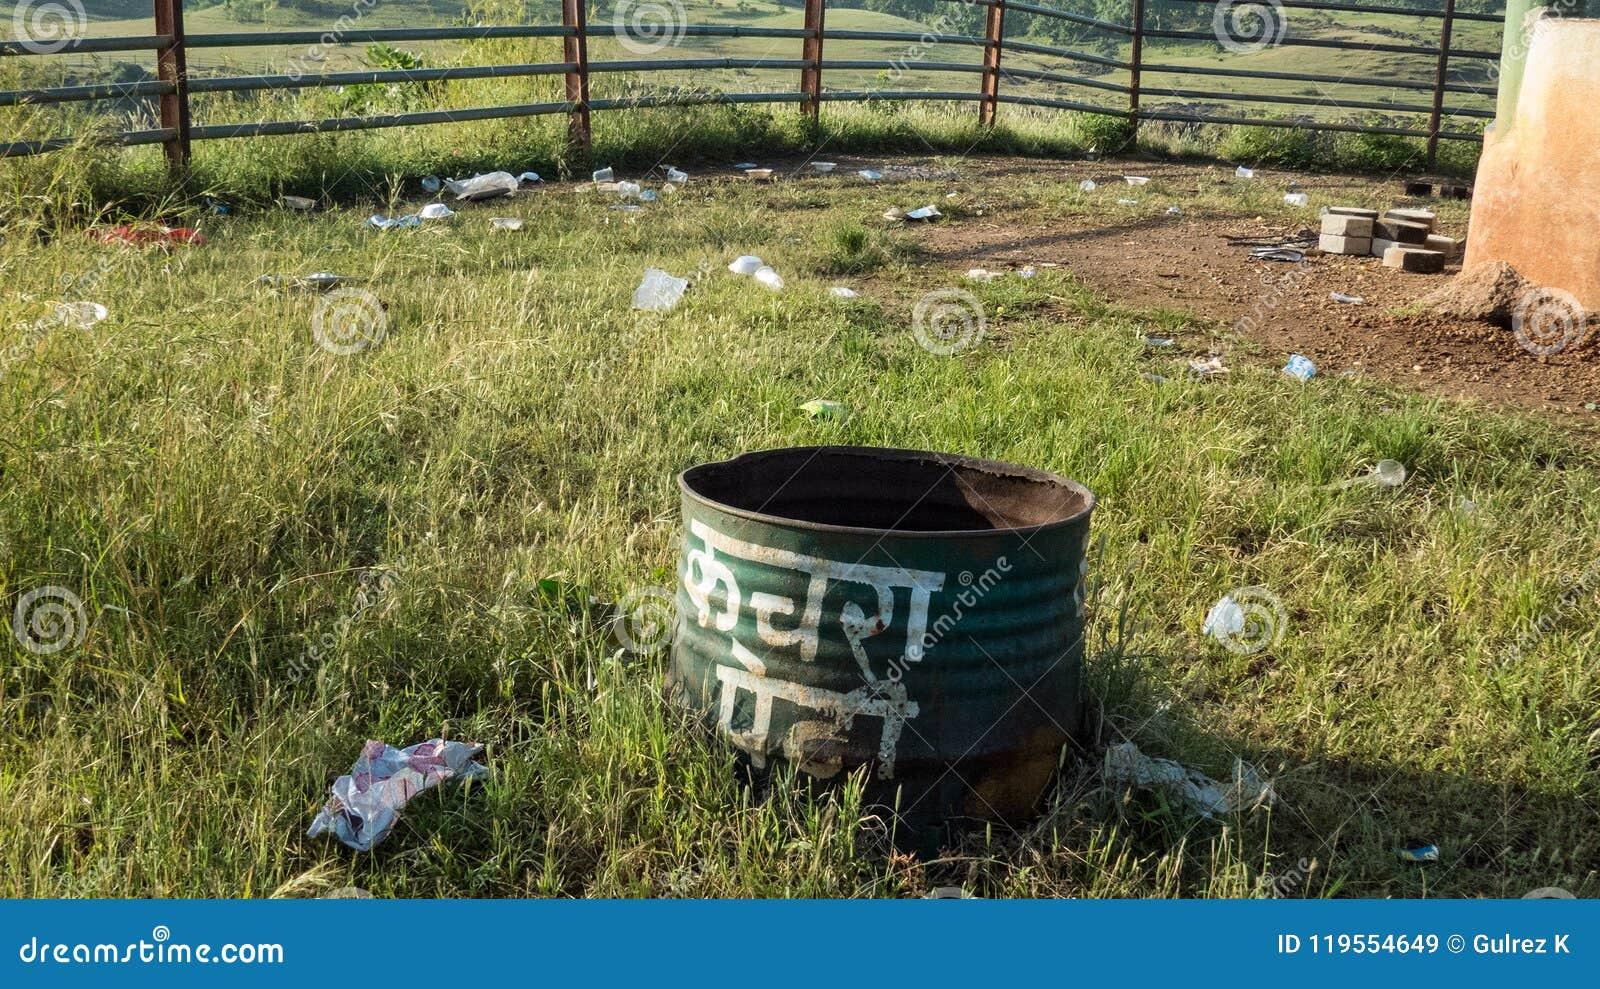 Garbage spread outside of a litter bin at picnic spot